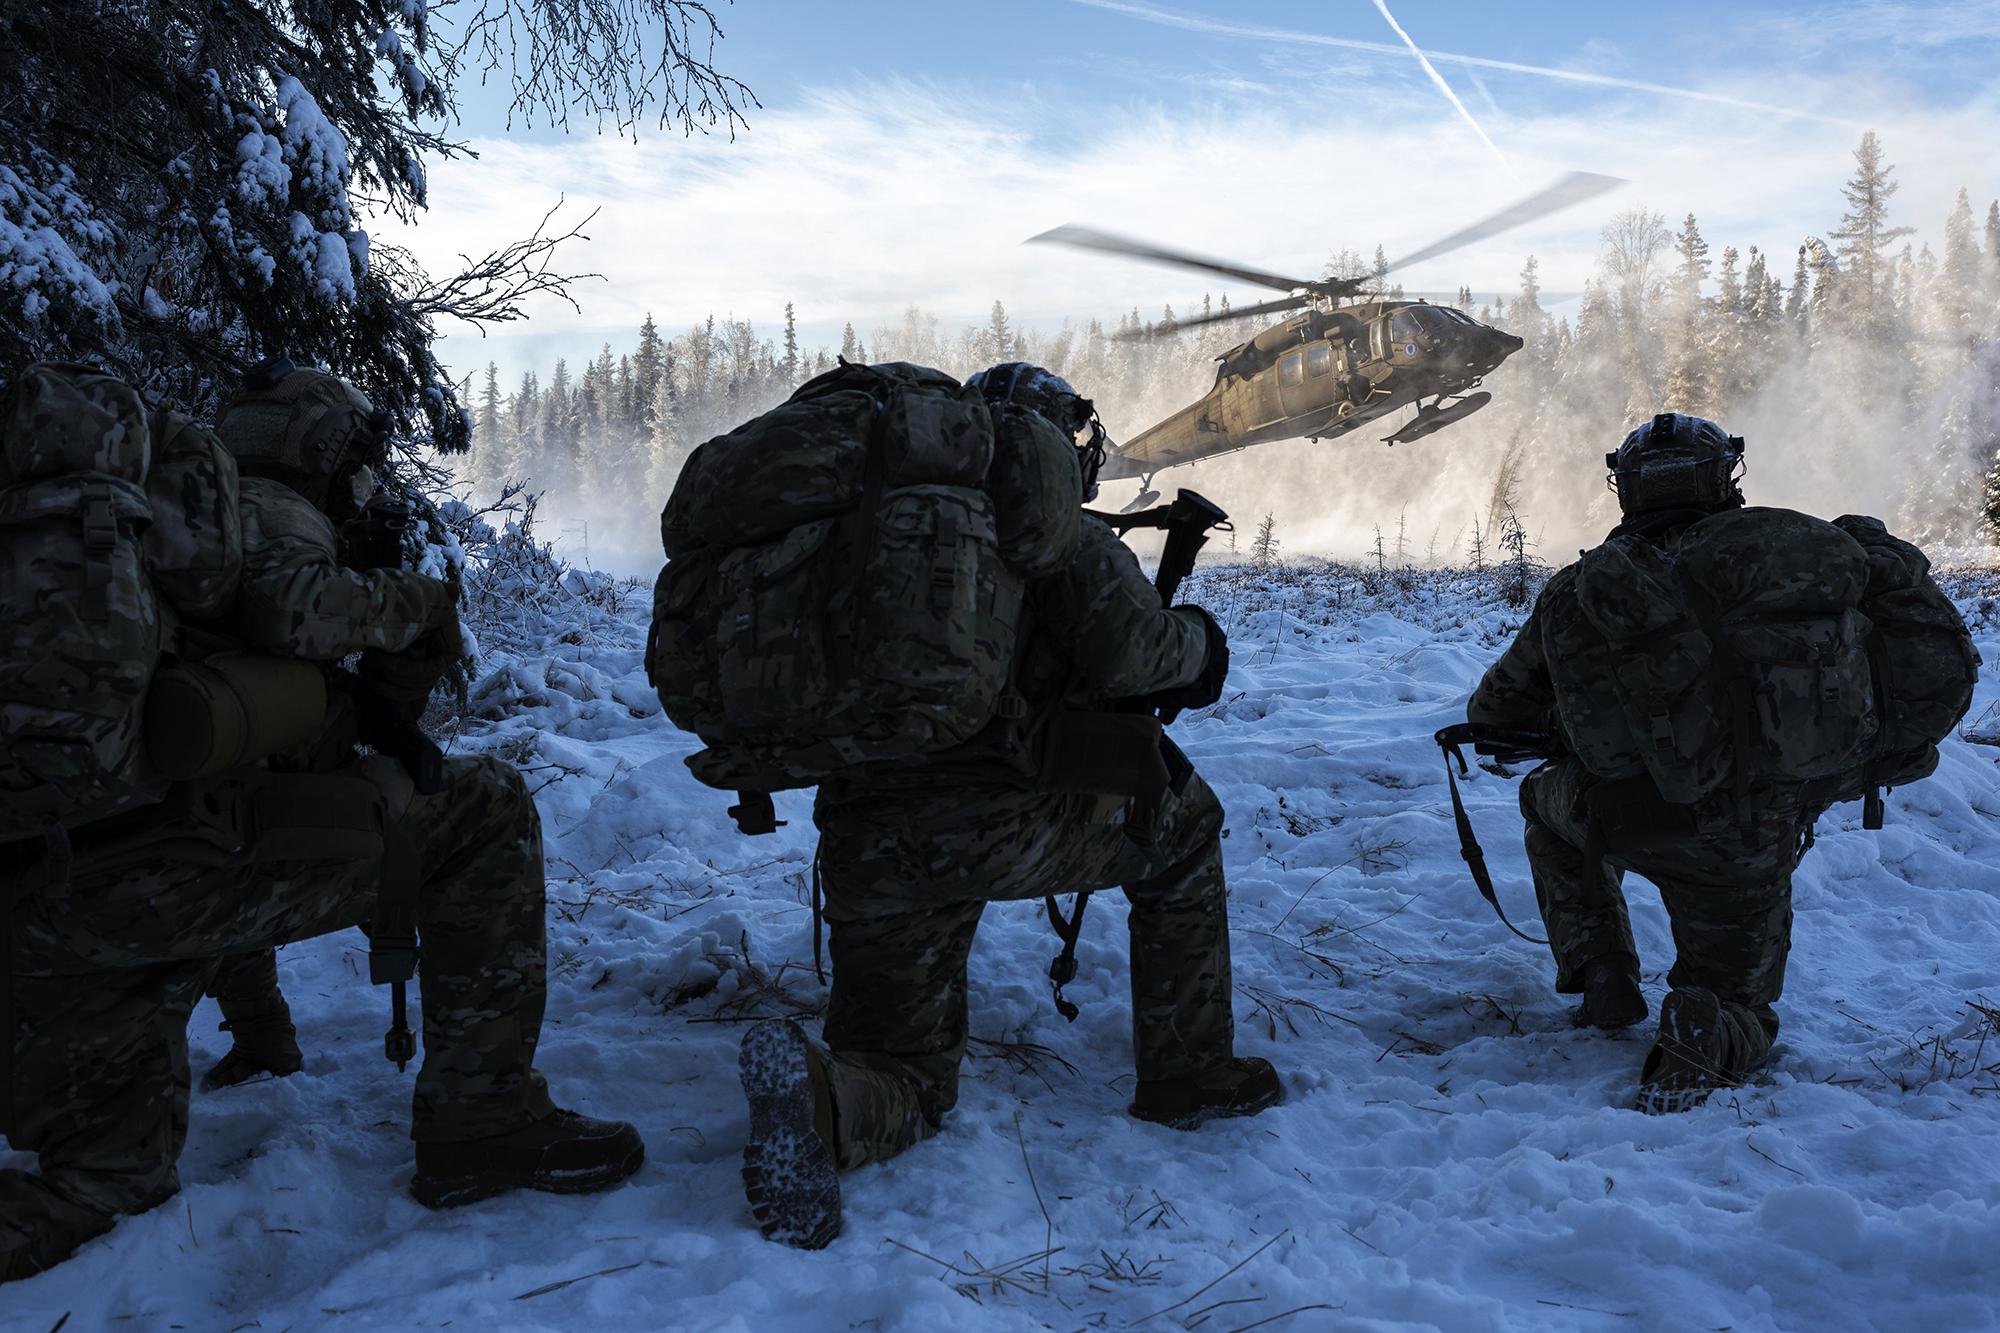 An Alaska Army National Guard UH-60L Black Hawk helicopter lands to pick up Air Force special warfare airmen during small-unit training at Joint Base Elmendorf-Richardson, Alaska, Nov. 18, 2020. (Alejandro Pena/Air Force)